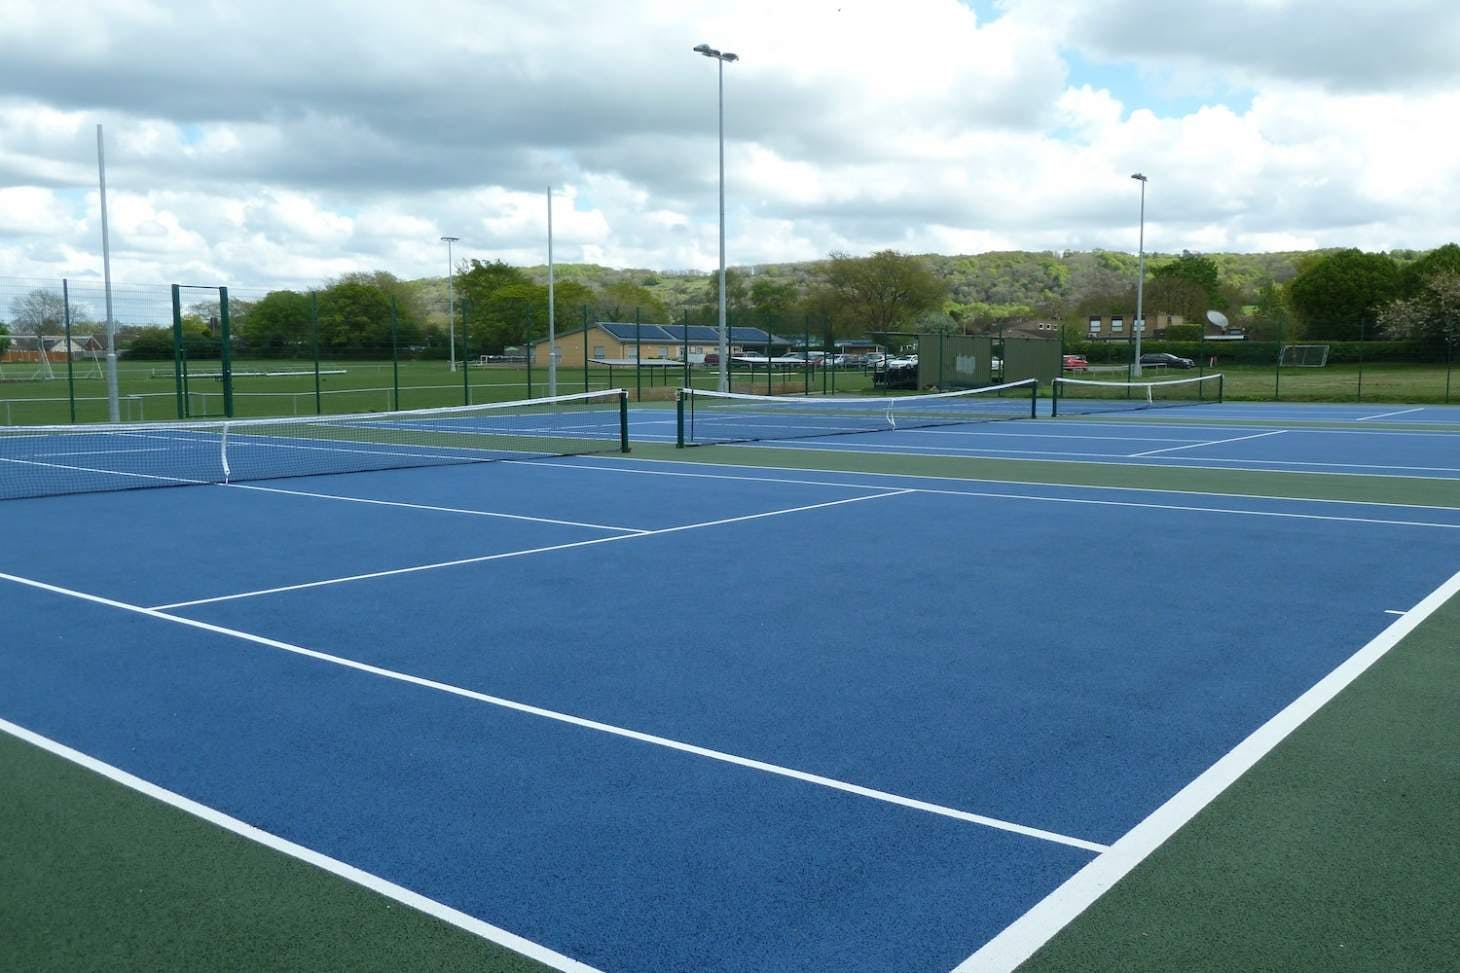 Chinnor Tennis Club Outdoor | Hard (macadam) tennis court